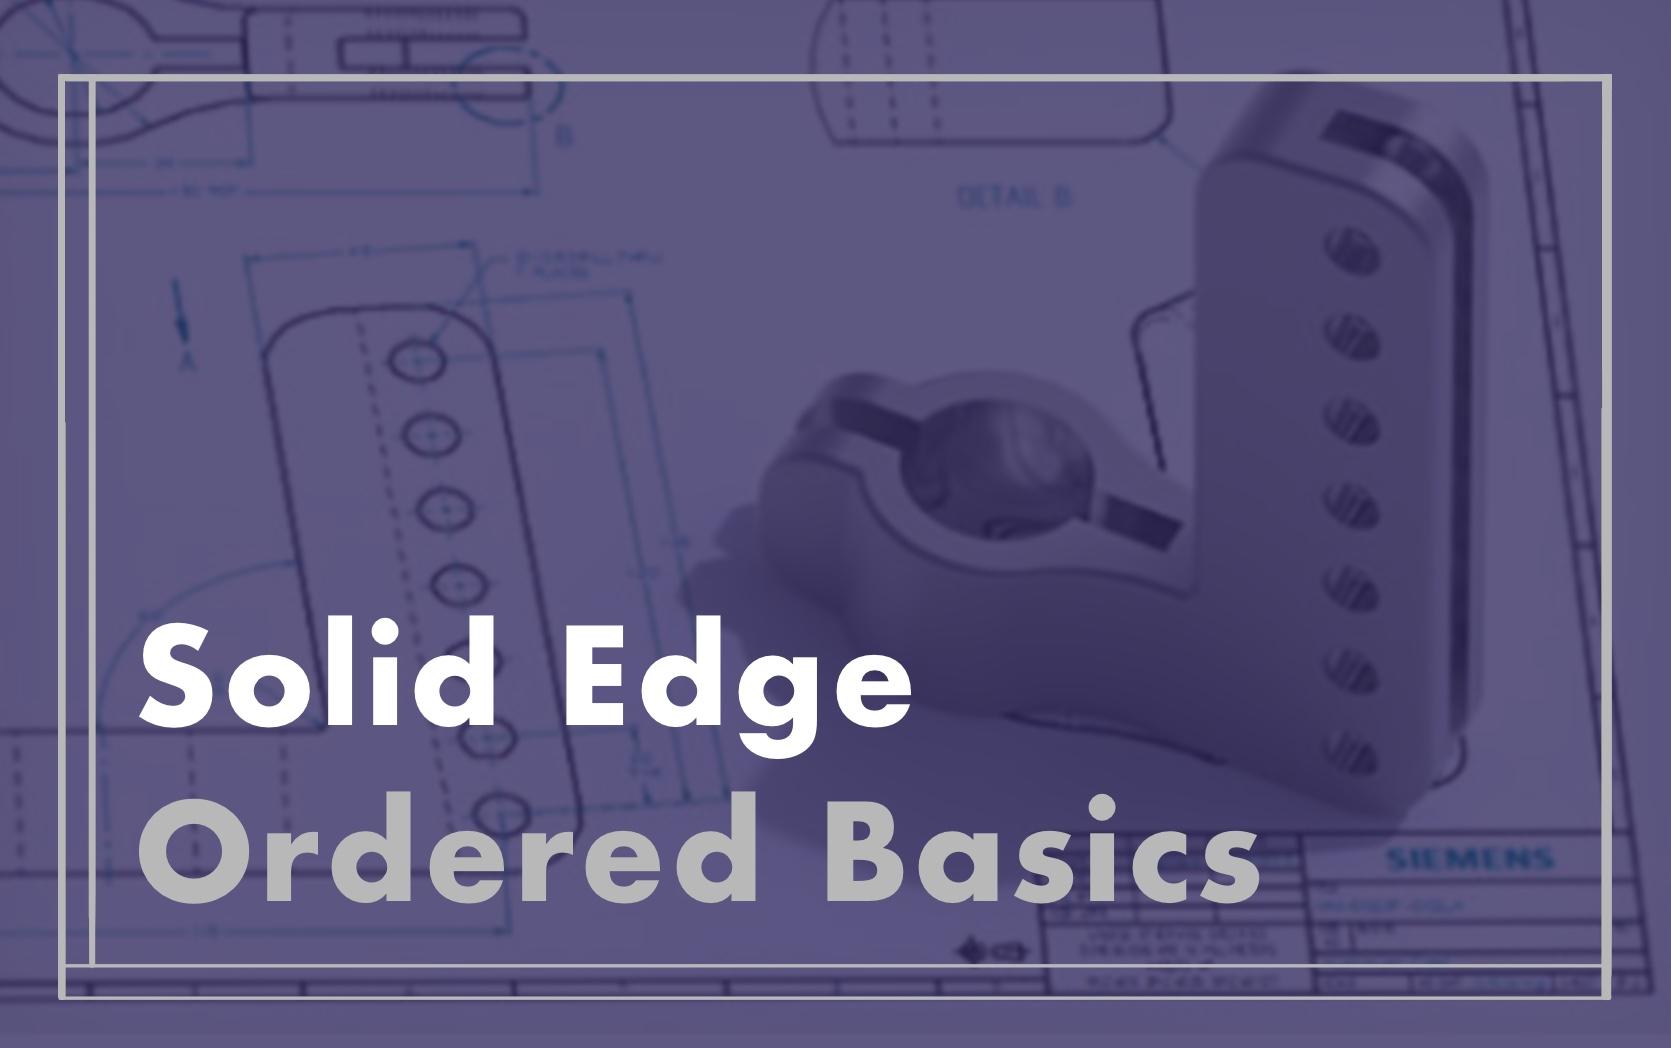 Solid Edge Ordered Basics